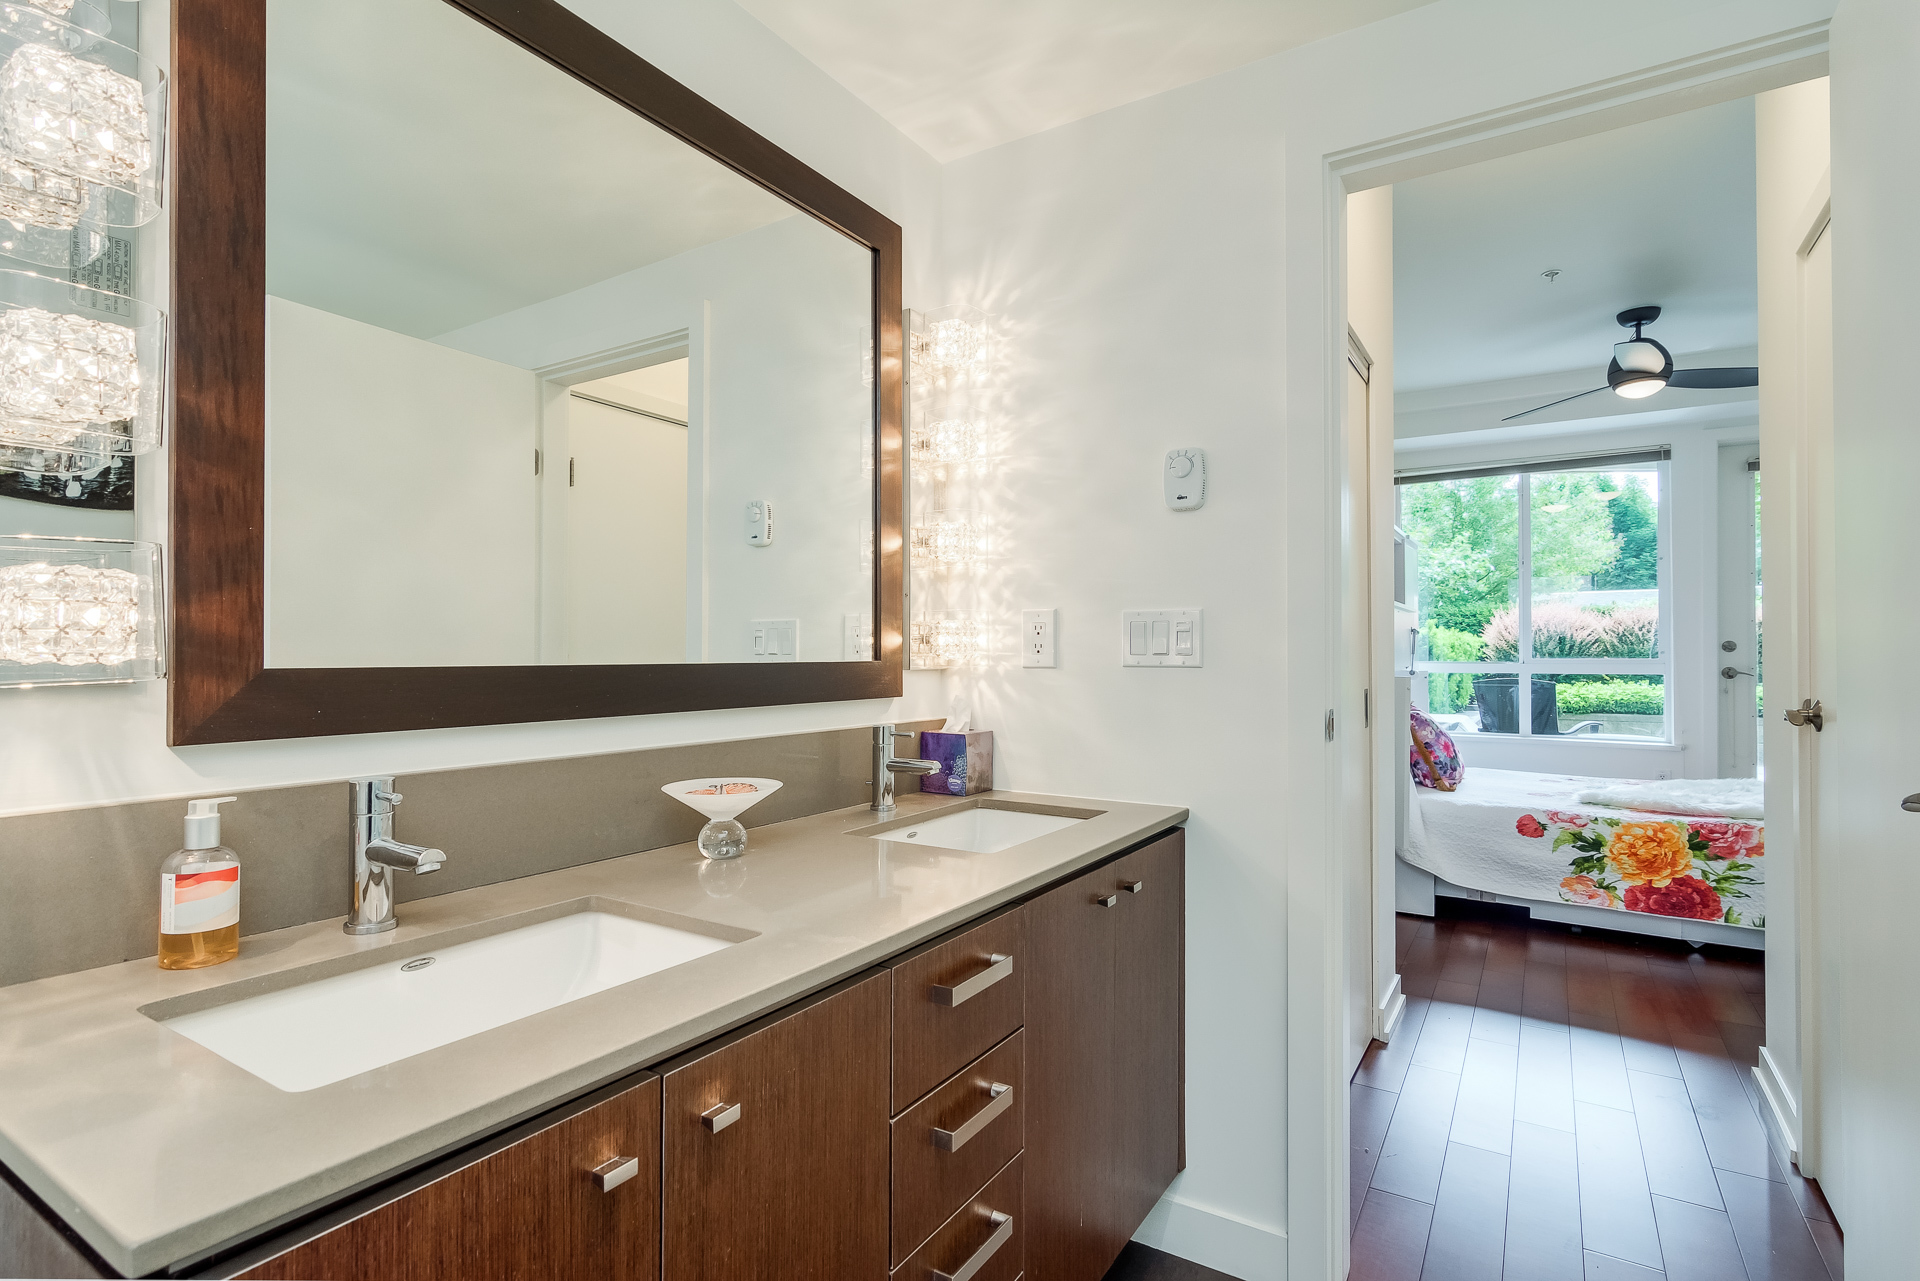 Master Bedroom Ensuite at 151 - 2950 King George Boulevard, King George Corridor, South Surrey White Rock